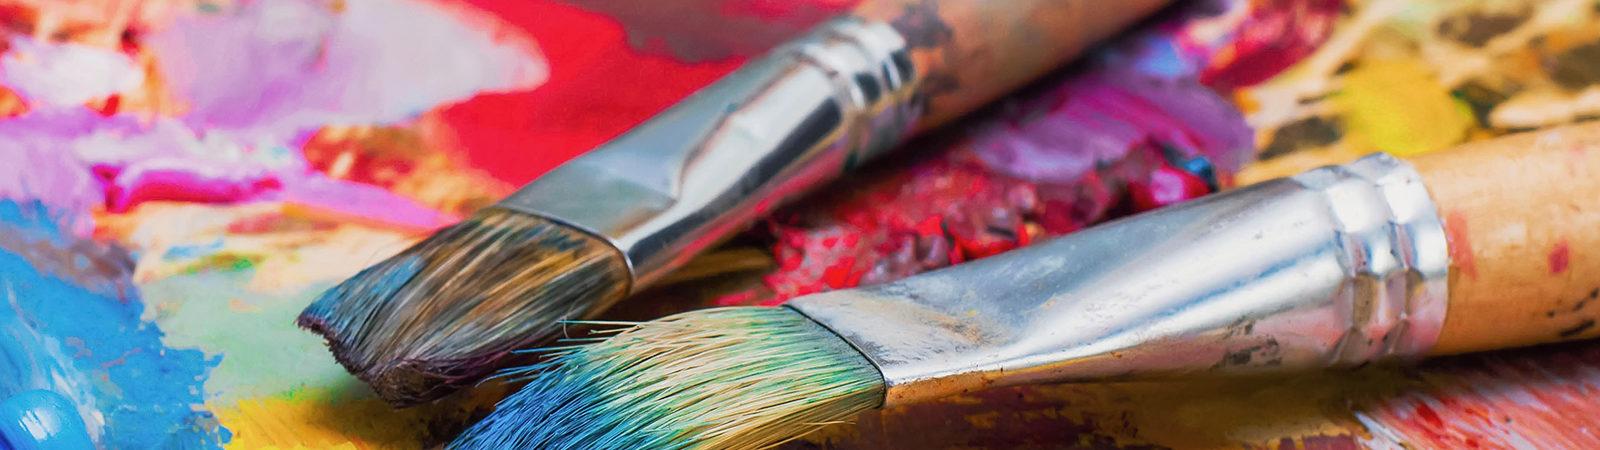 Paint-AdobeStock